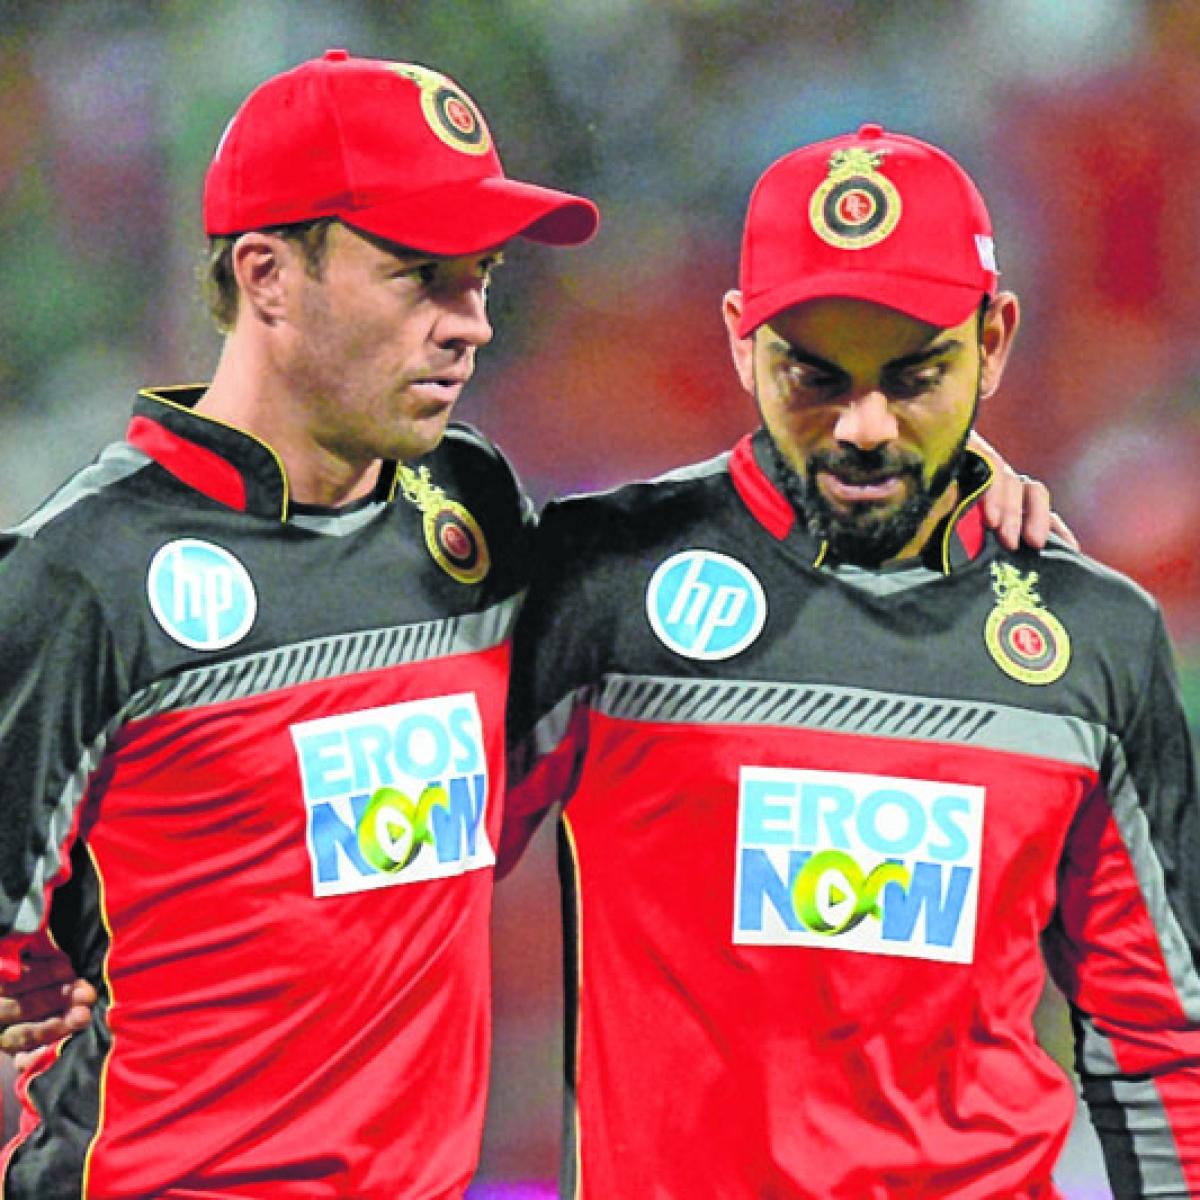 MS Dhoni named captain in India-South Africa dream XI team chosen by Virat Kohli, AB de Villiers